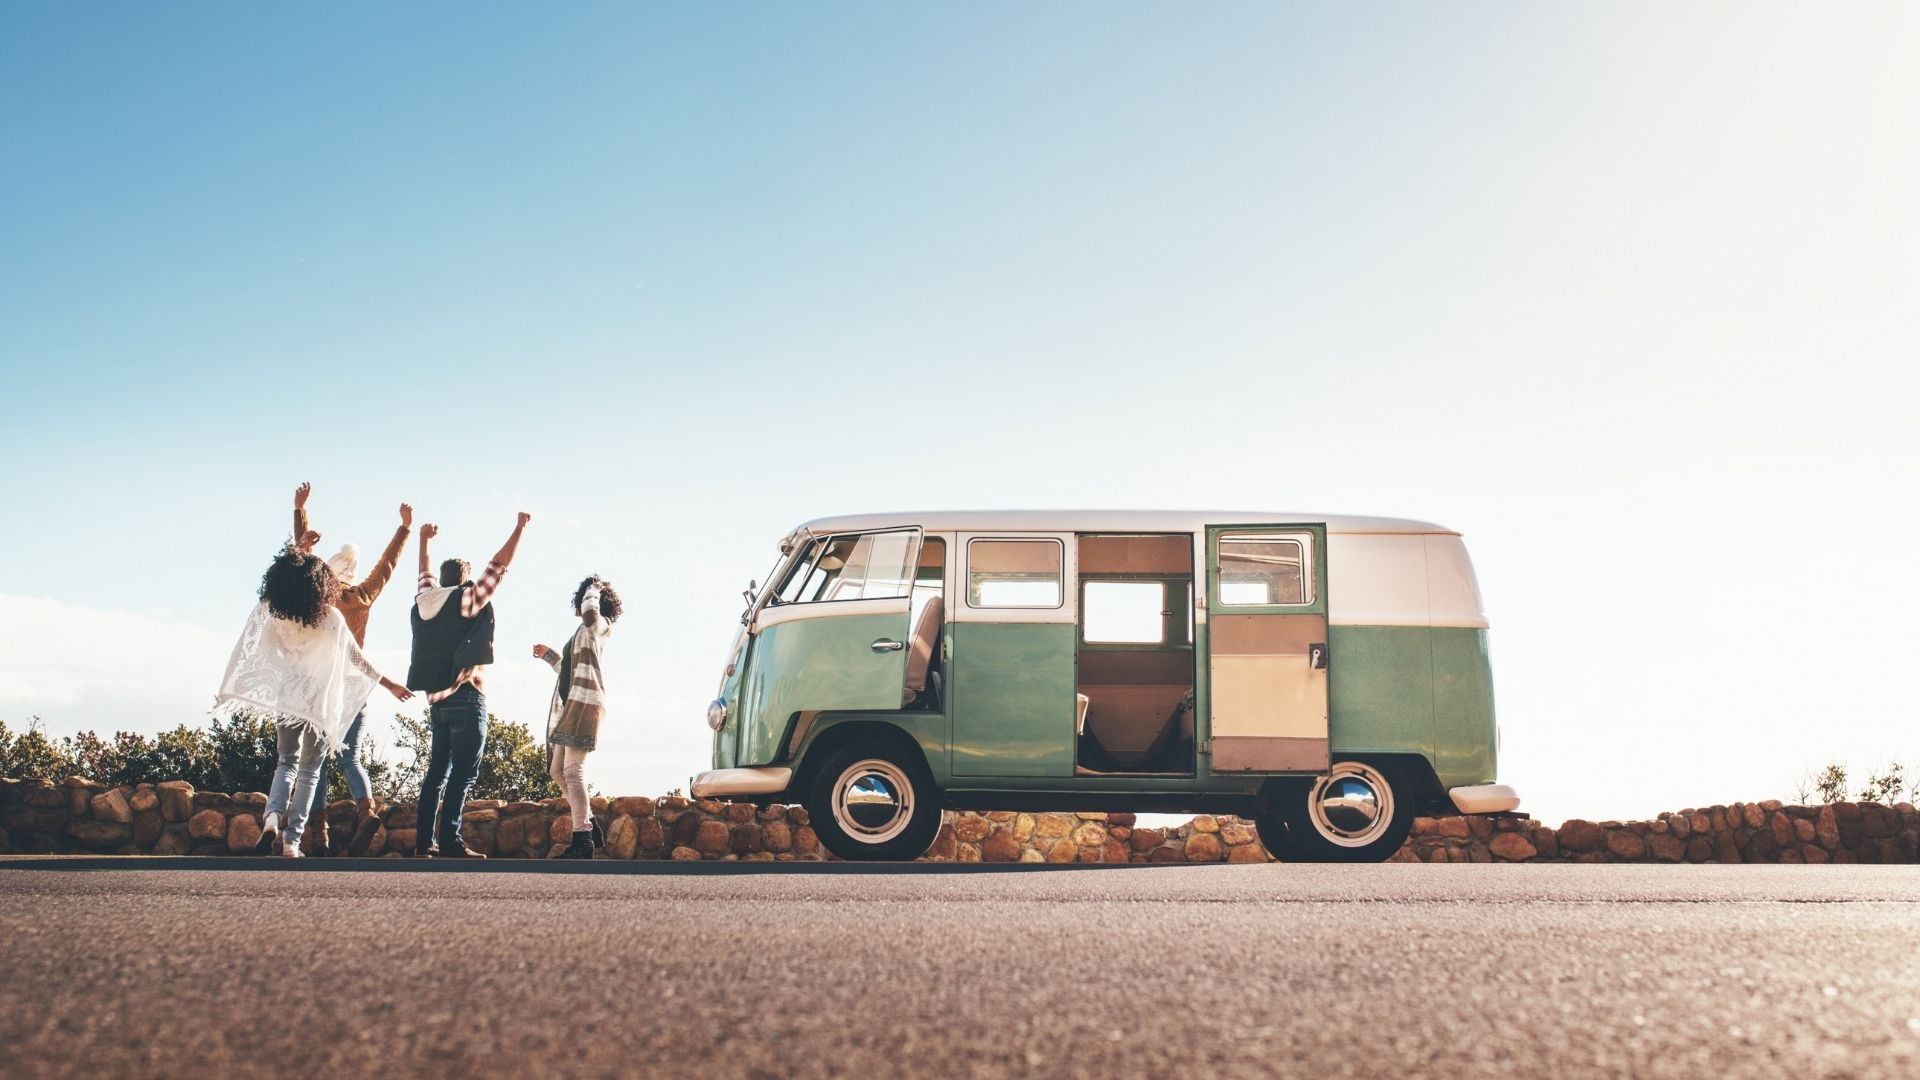 can I rent my campervan